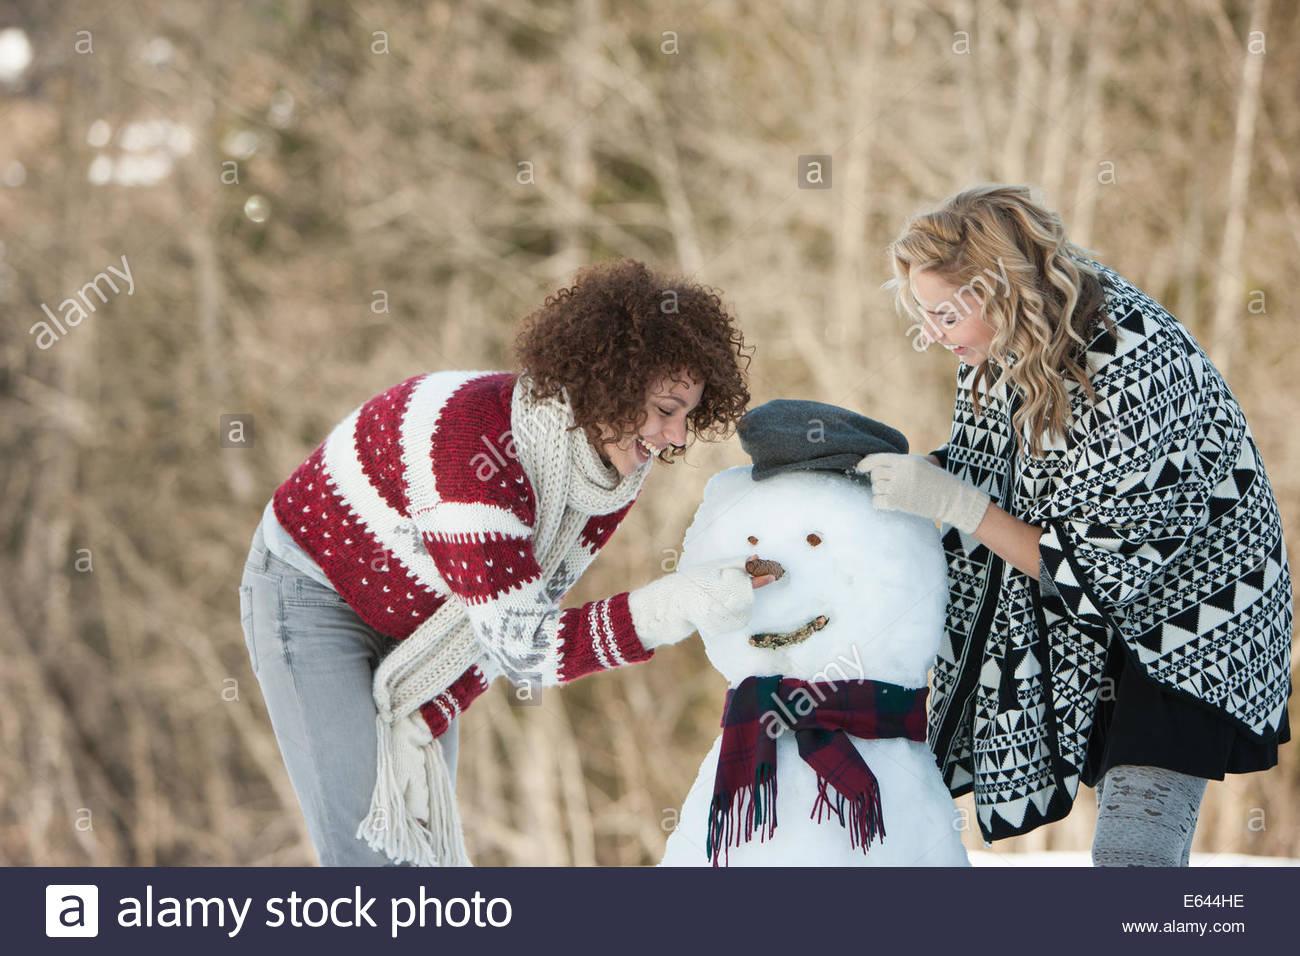 Two women building snowman - Stock Image